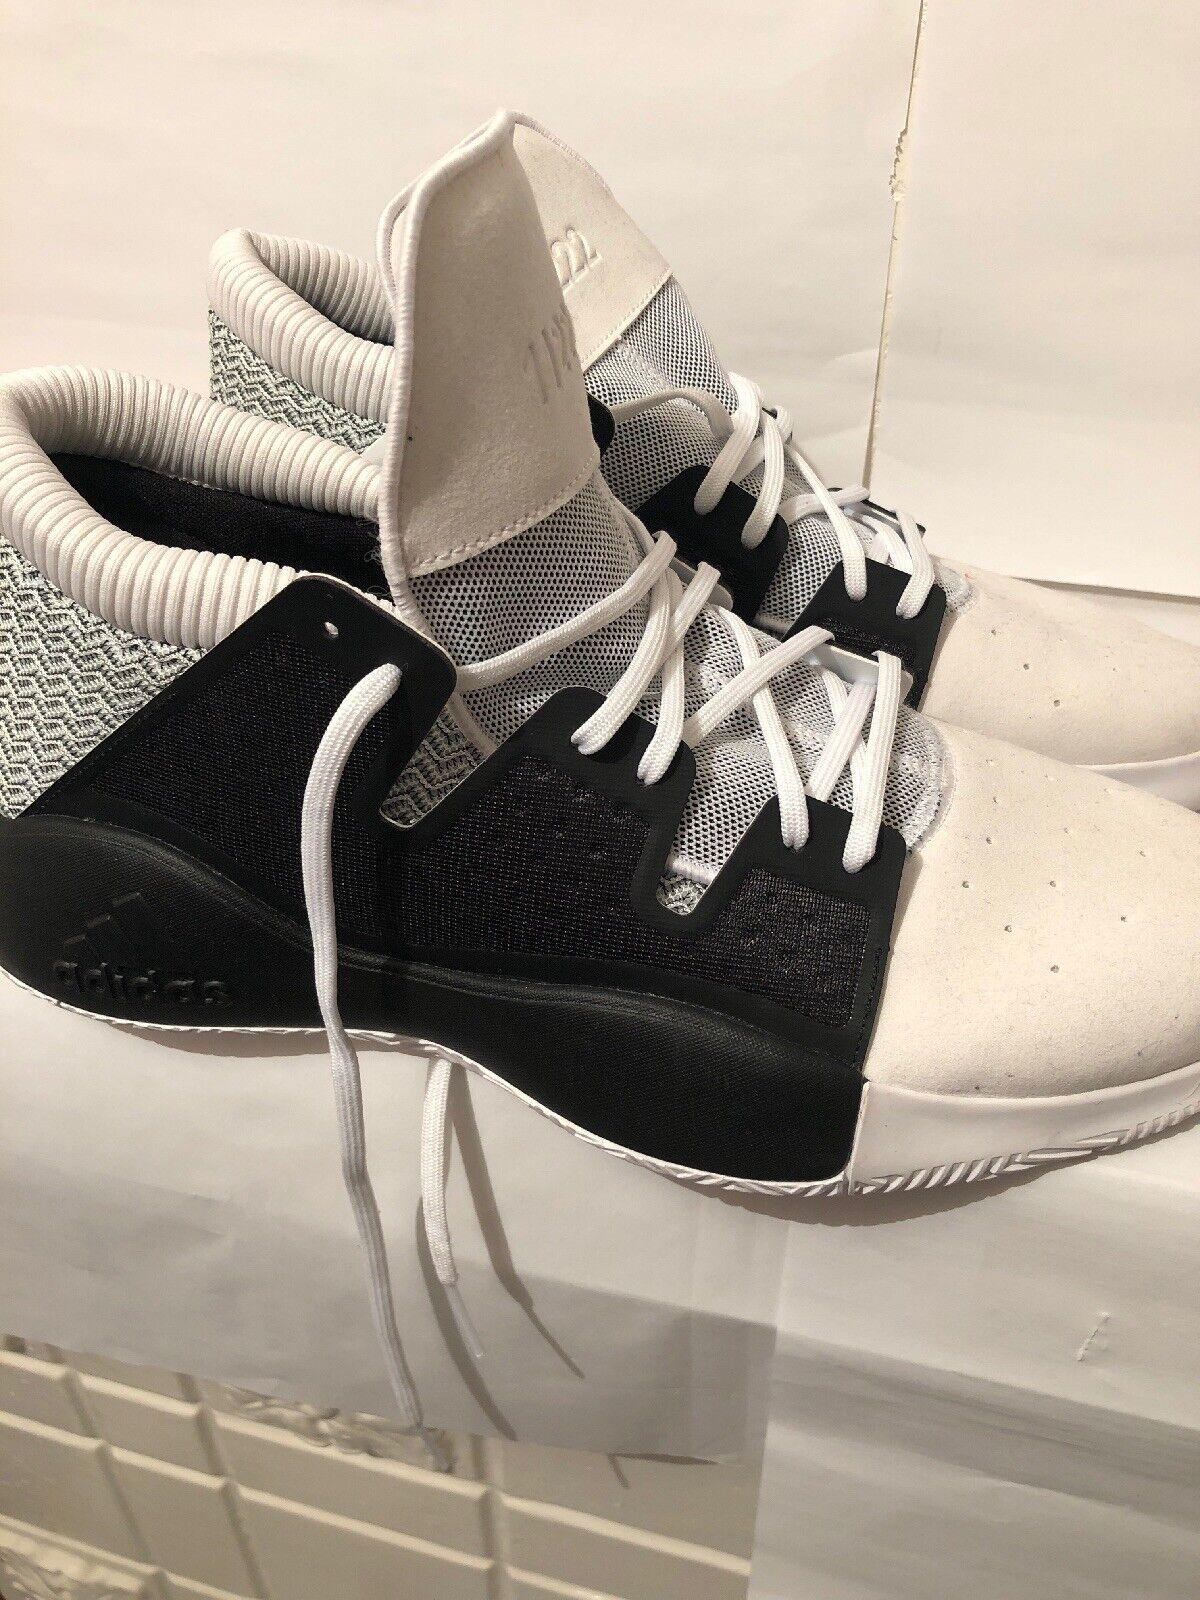 Mona Lisa pasar por alto Reprimir  Adidas Pro Bounce Madness купить в Америке, лот 283775568823